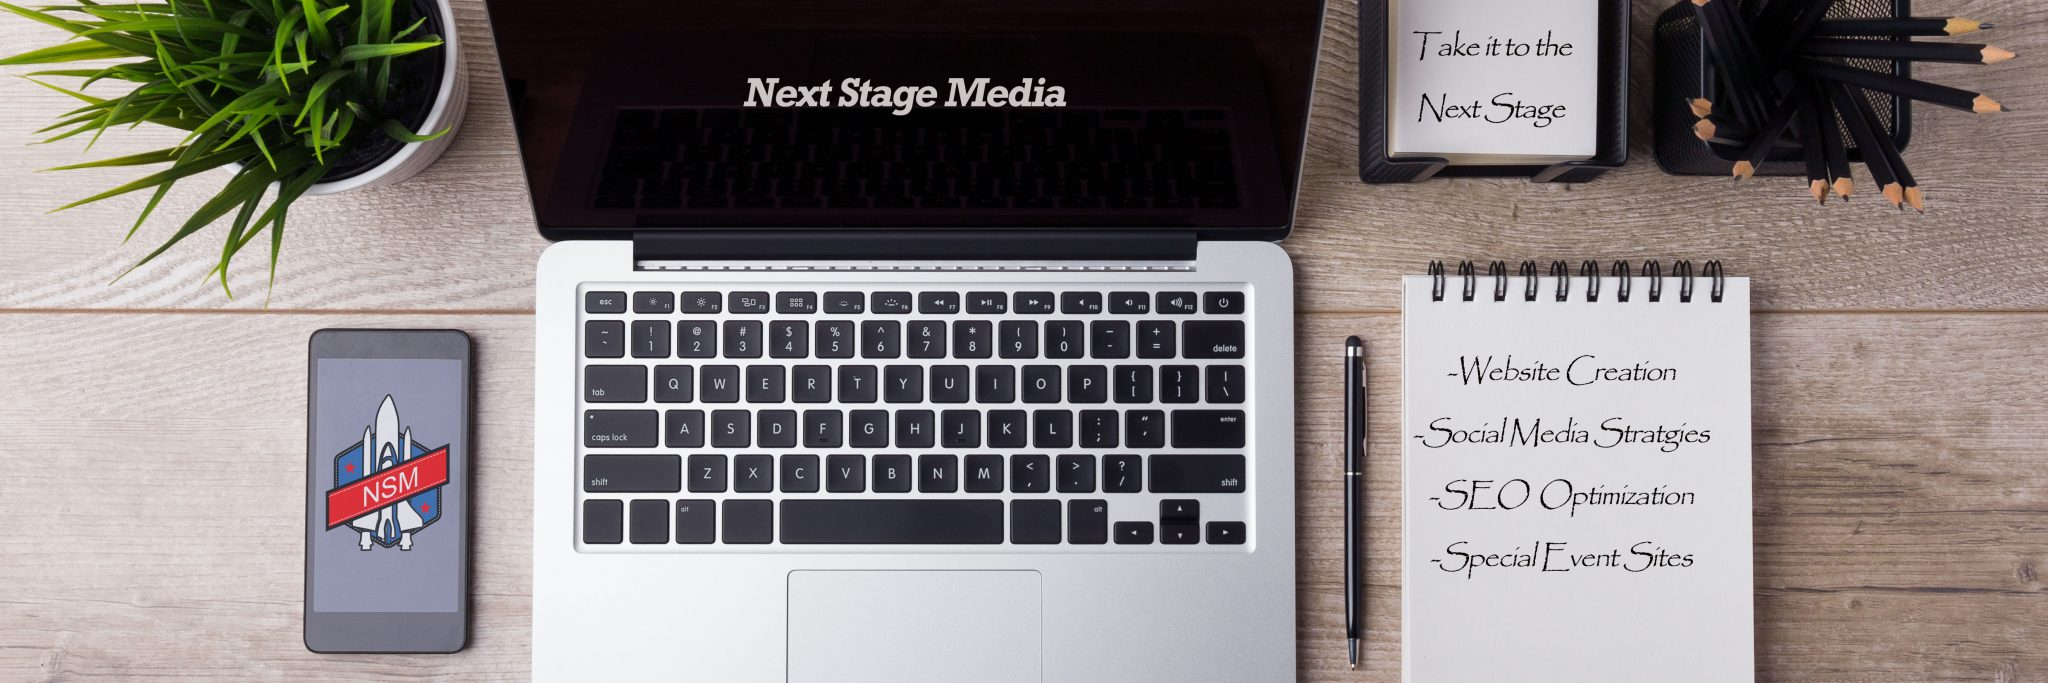 Next Stage Media